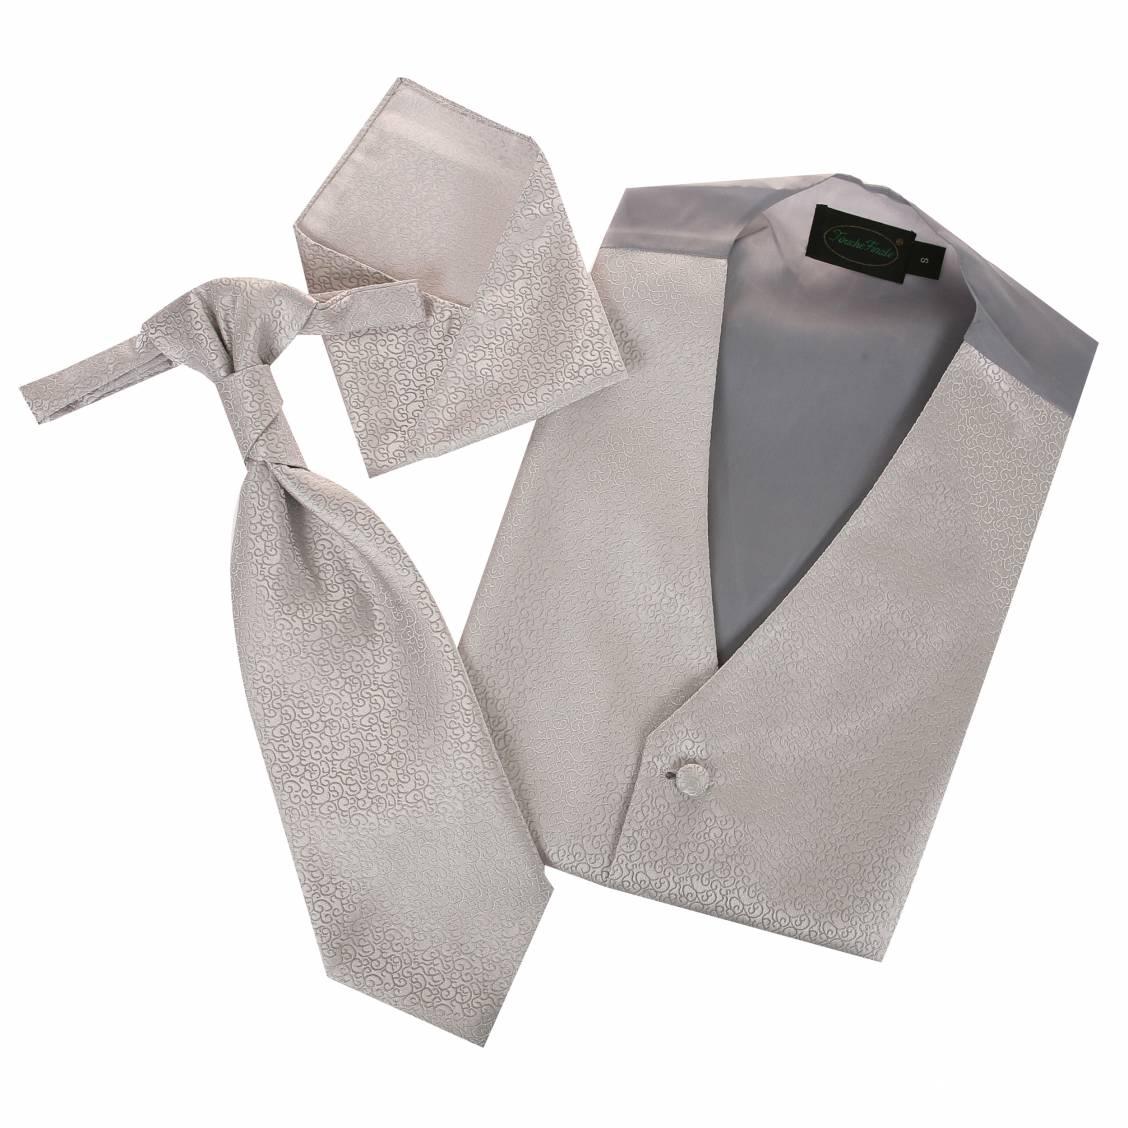 costume guy laurent gilet tailleur homme gris perle 2336 10 car interior design. Black Bedroom Furniture Sets. Home Design Ideas